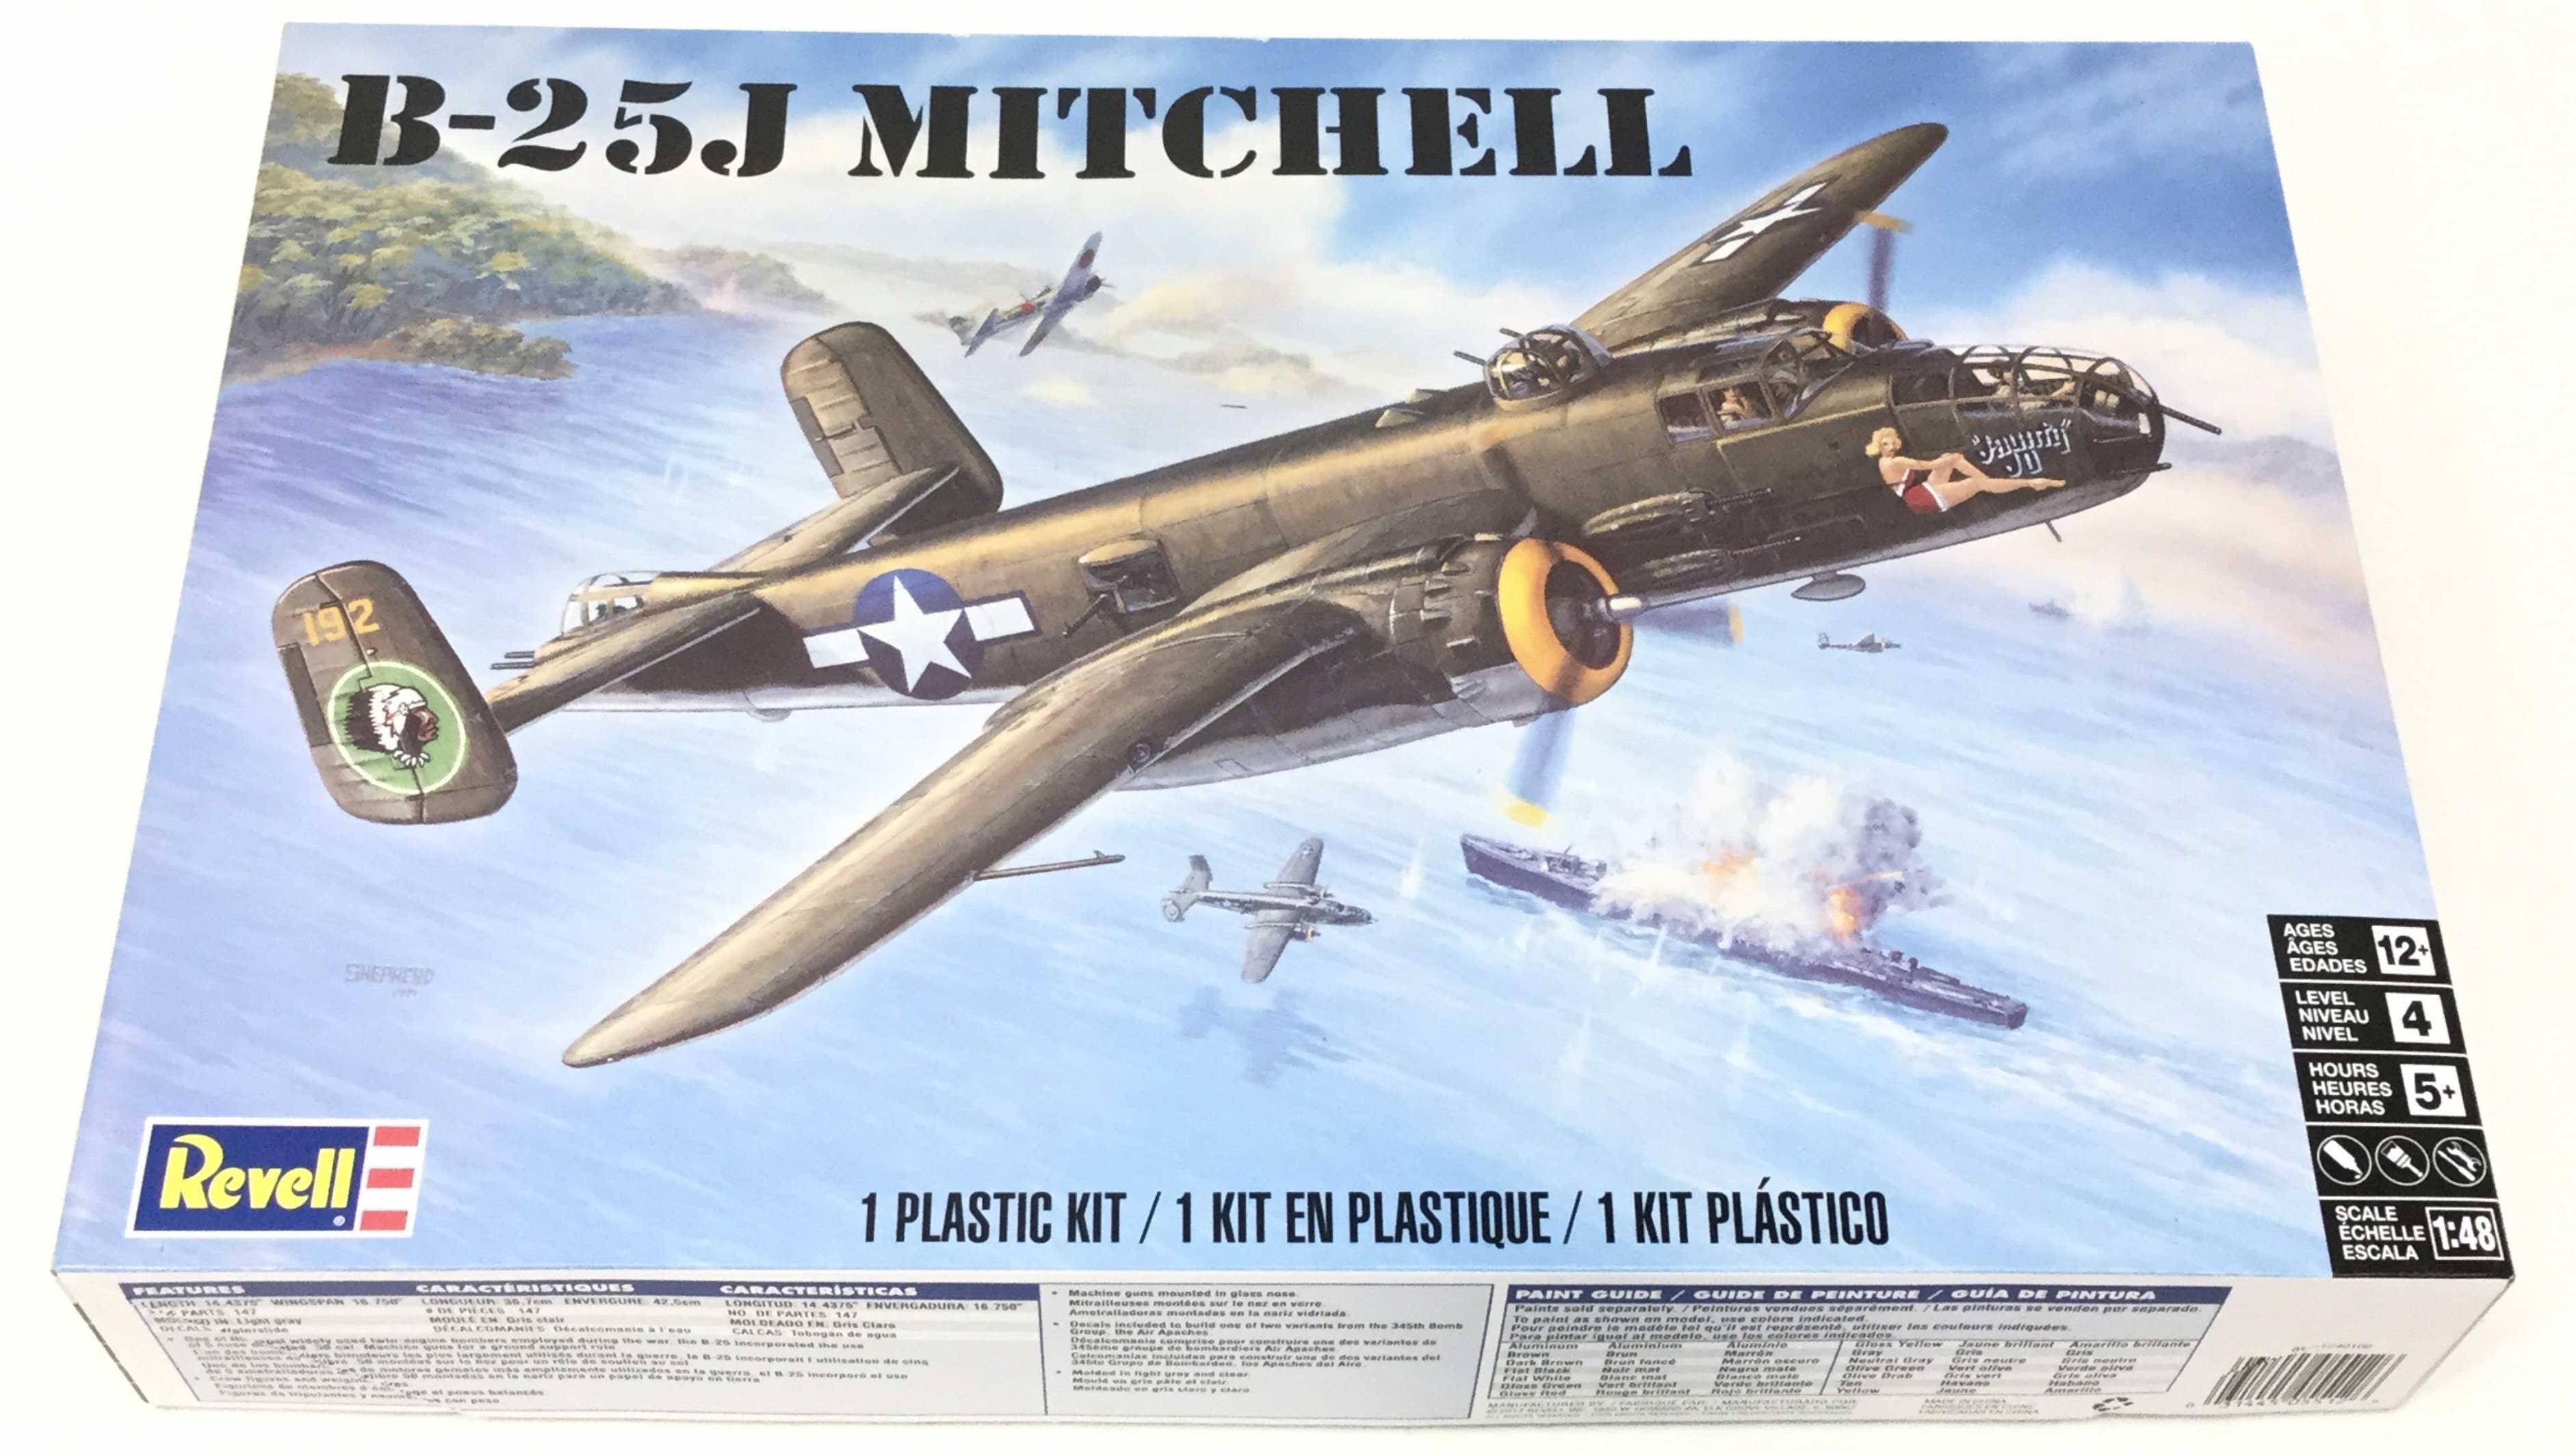 Revell B-25j Mitchell Model Kit